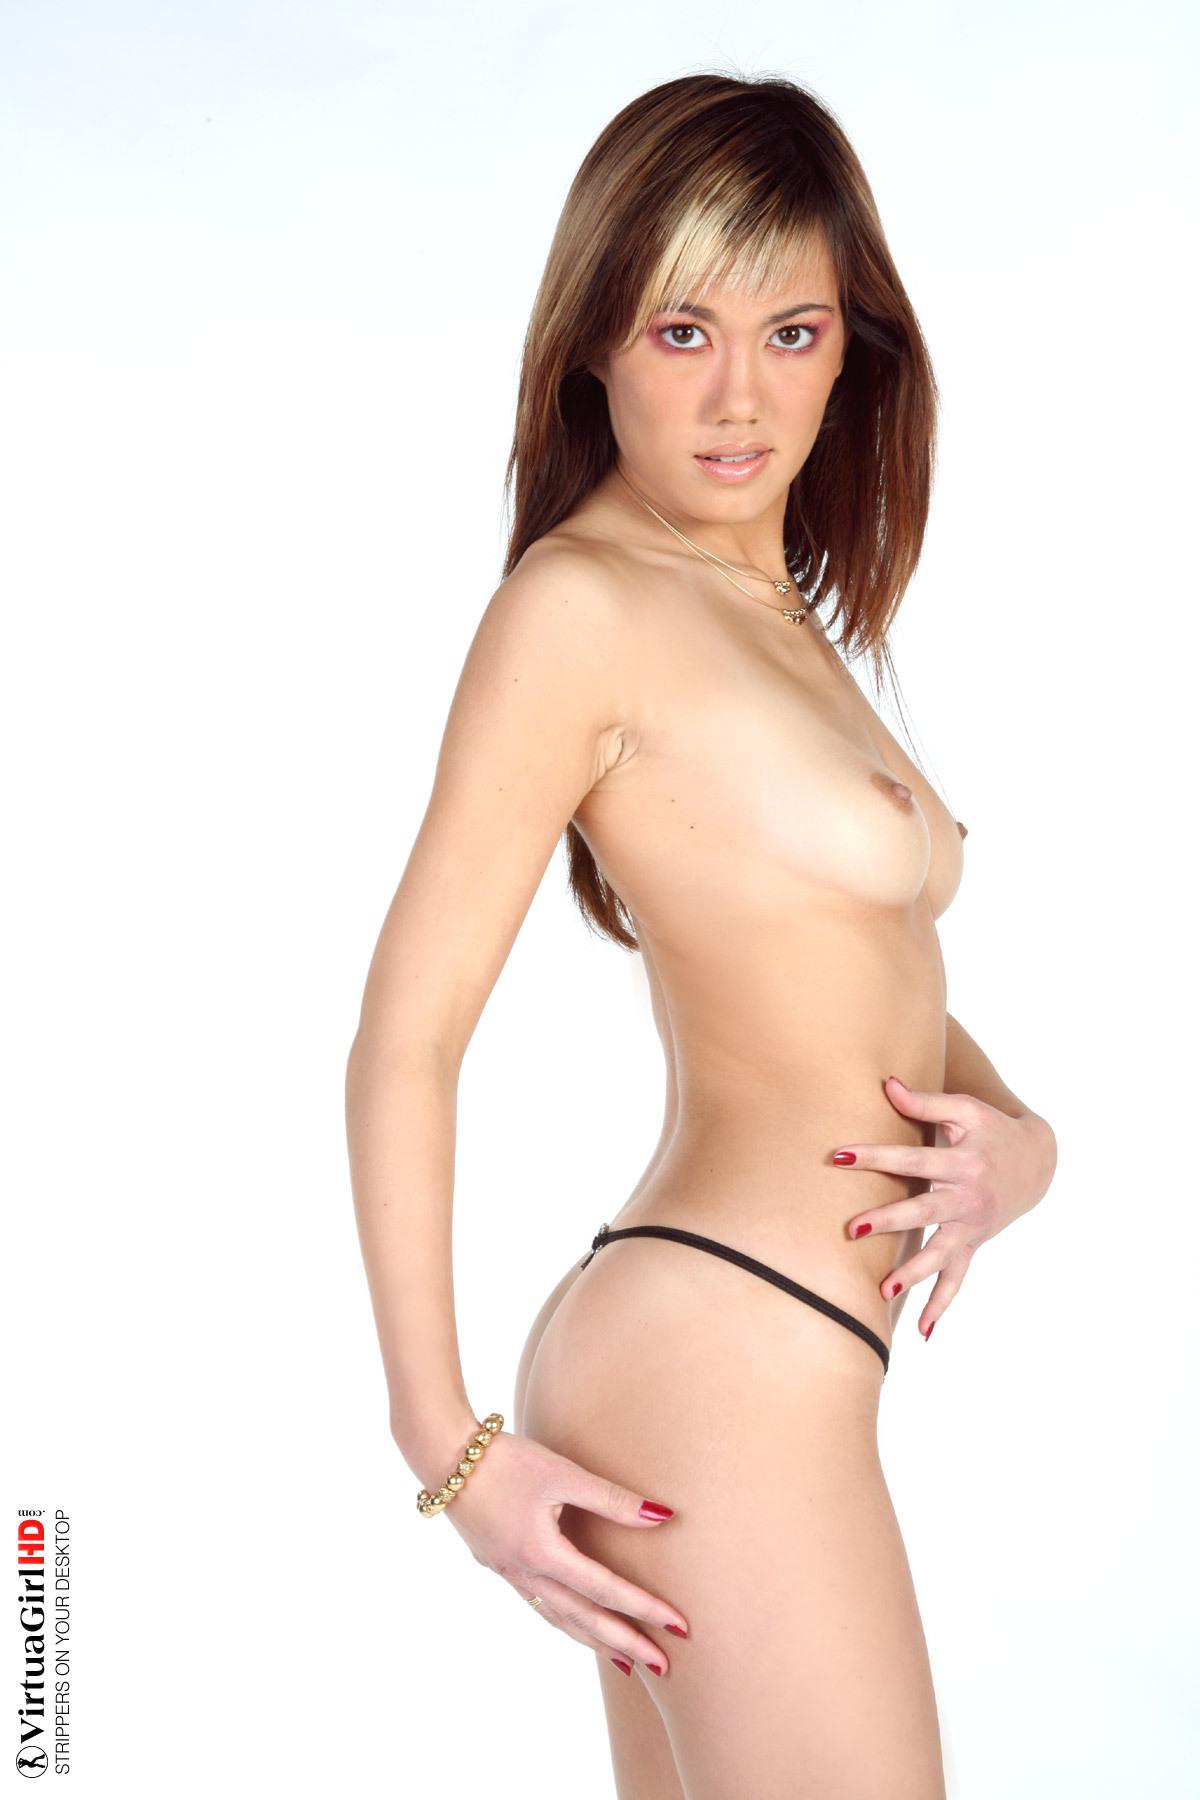 hot girl desktop wallpaper